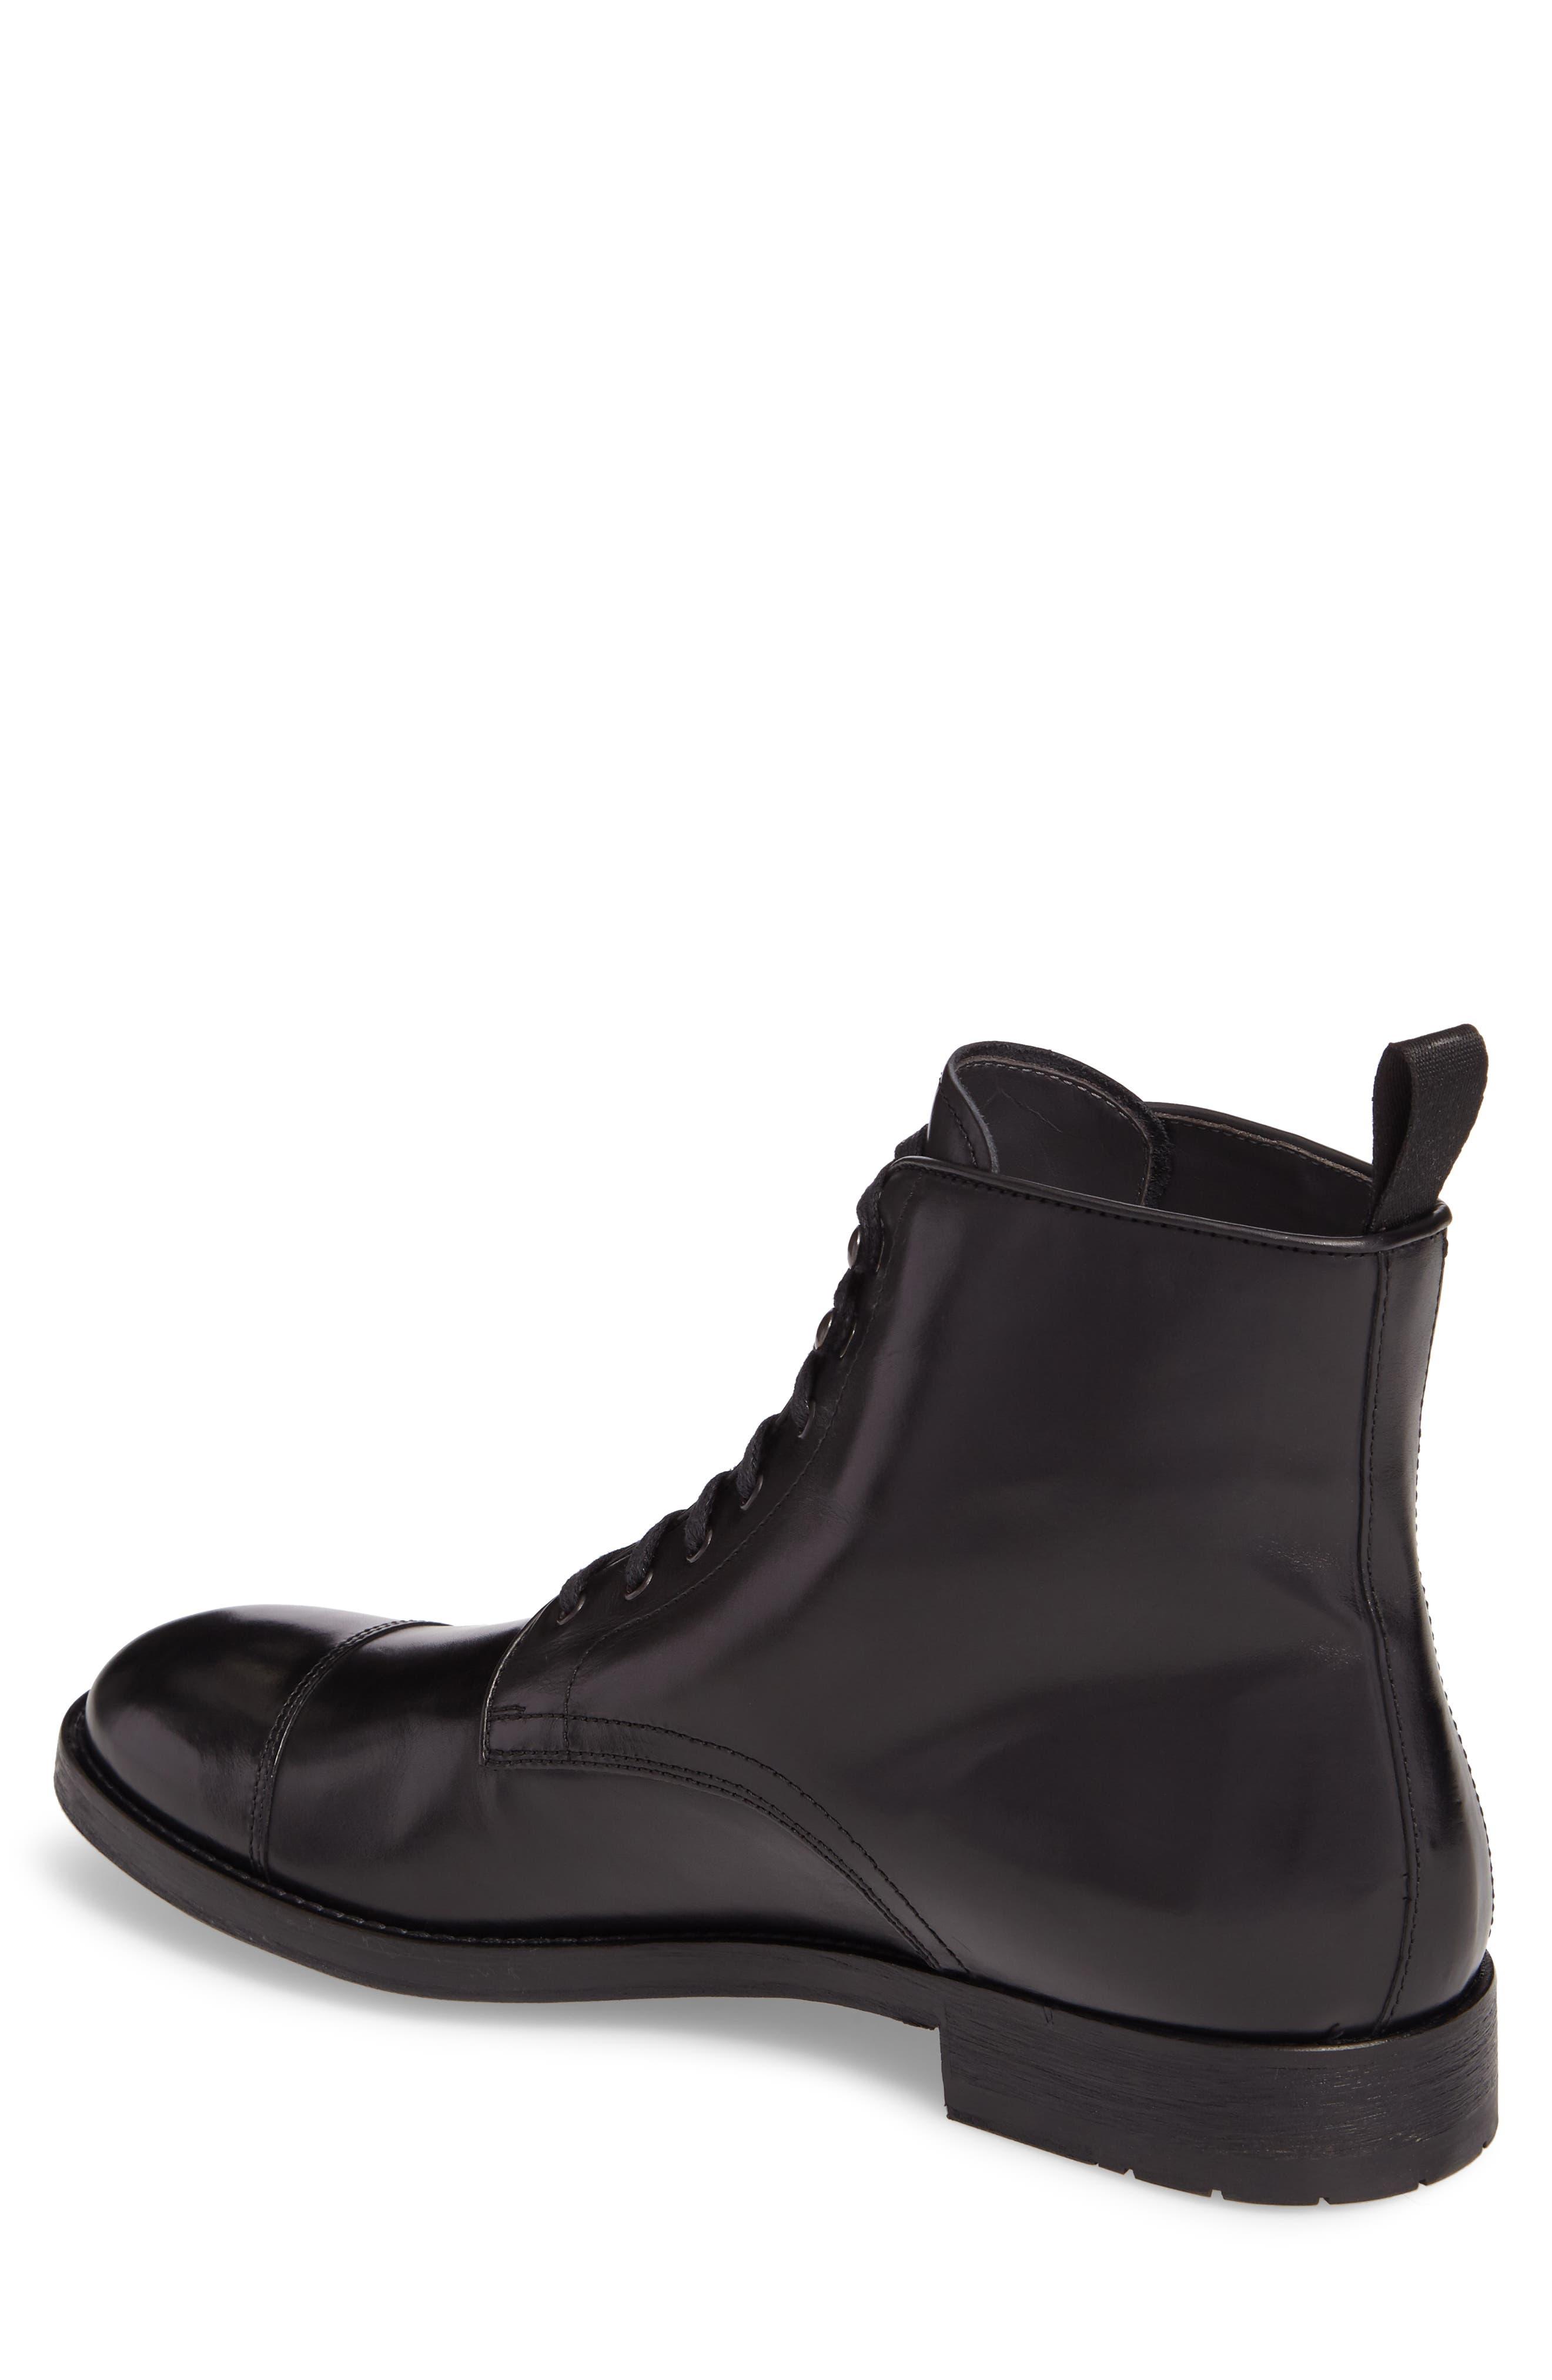 Bondfield Cap Toe Boot,                             Alternate thumbnail 2, color,                             Black